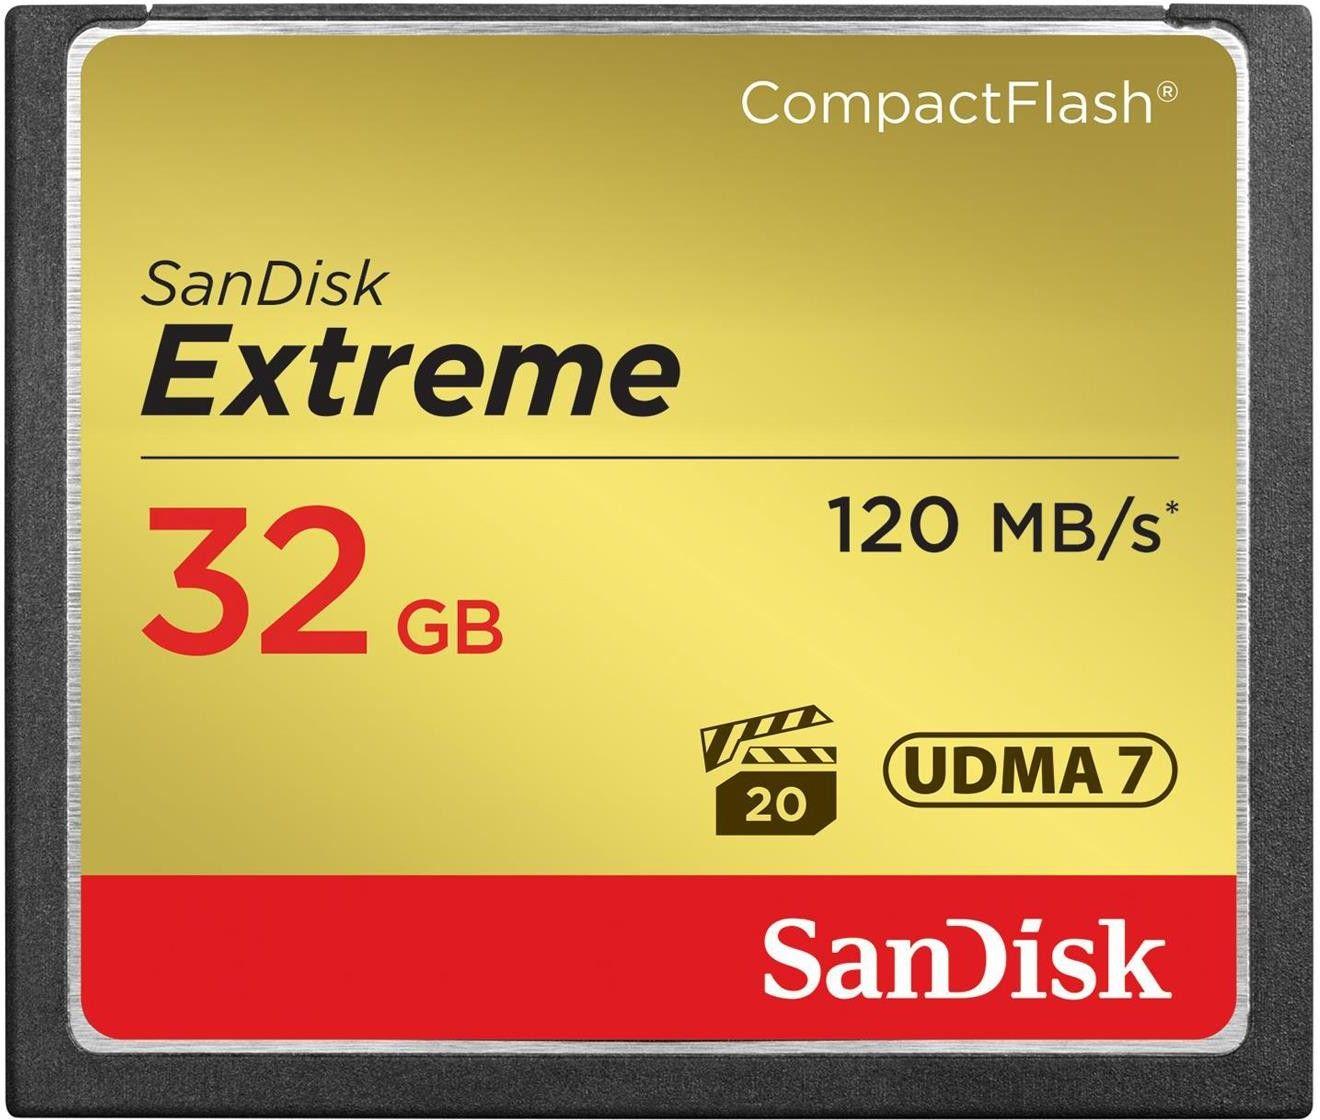 Karta pamięci SanDisk Compact Flash 32 GB Extreme 120 MB/s